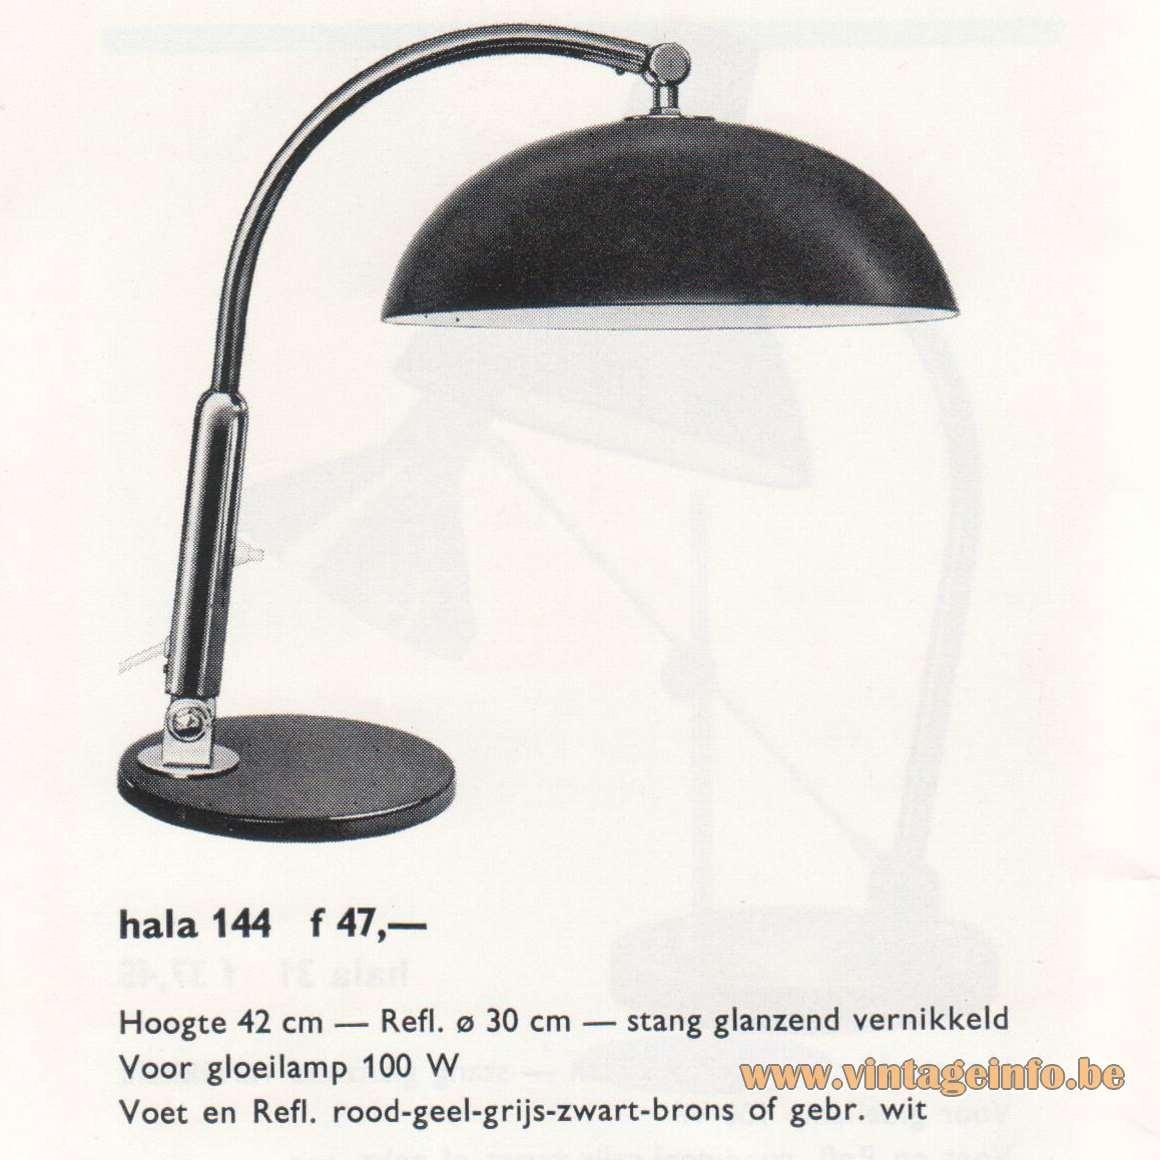 Hala 144 Desk Lamp - Catalogue 1967